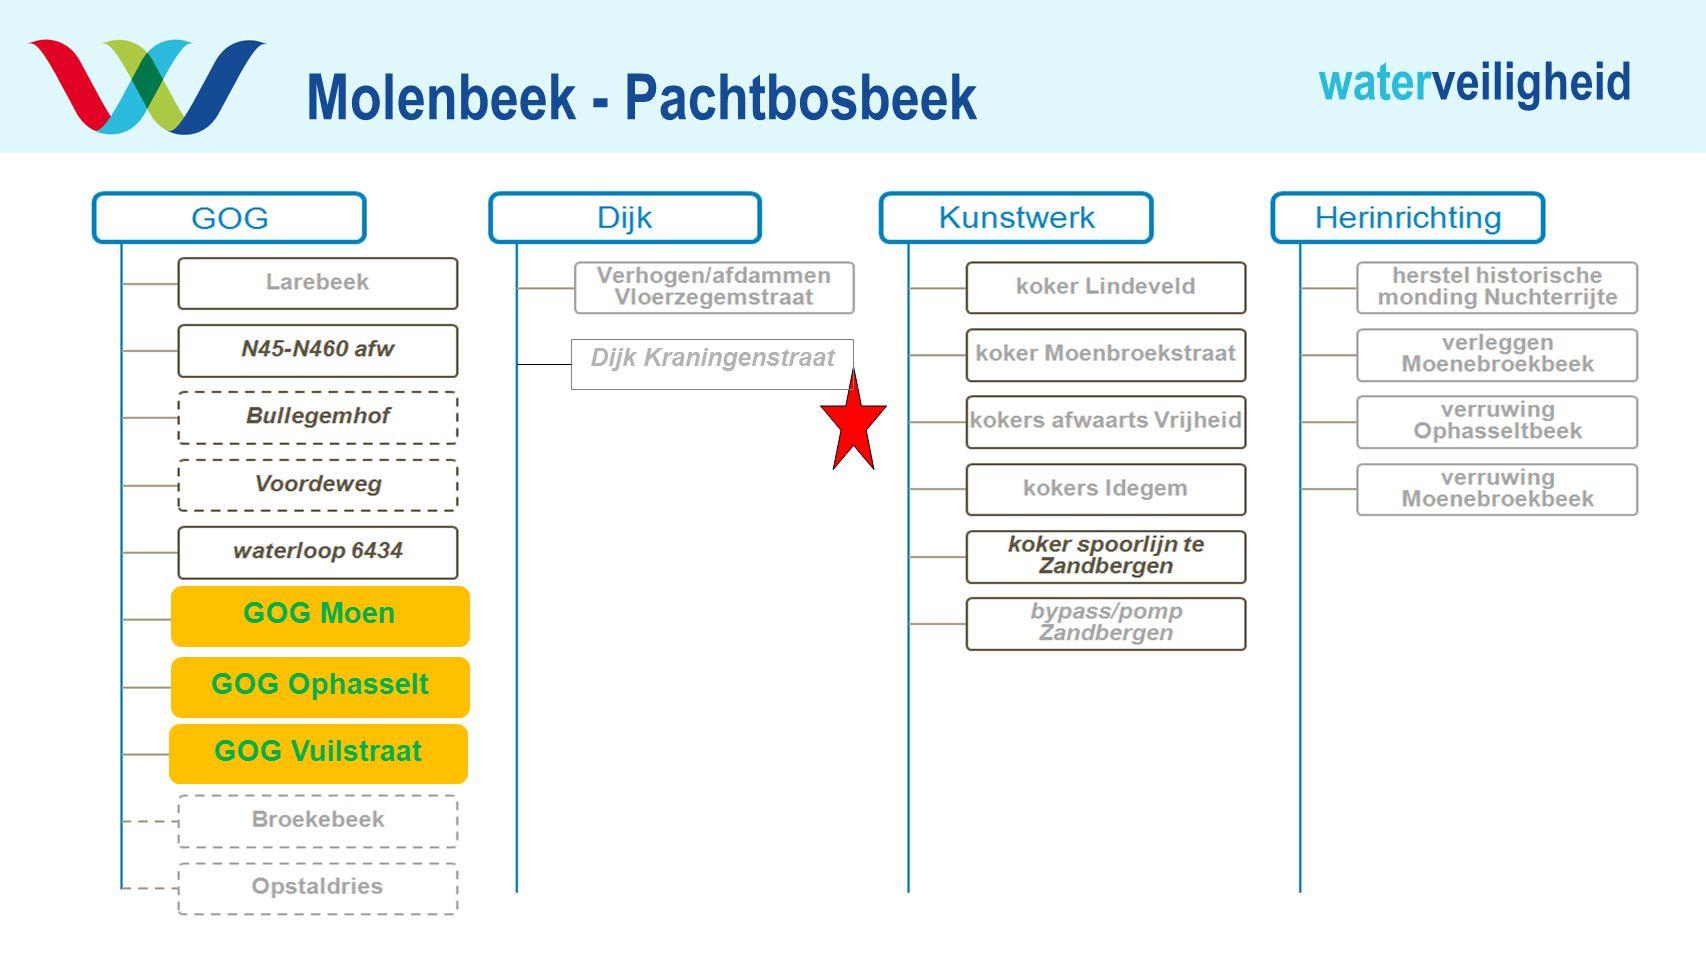 Molenbeek - Pachtbosbeek